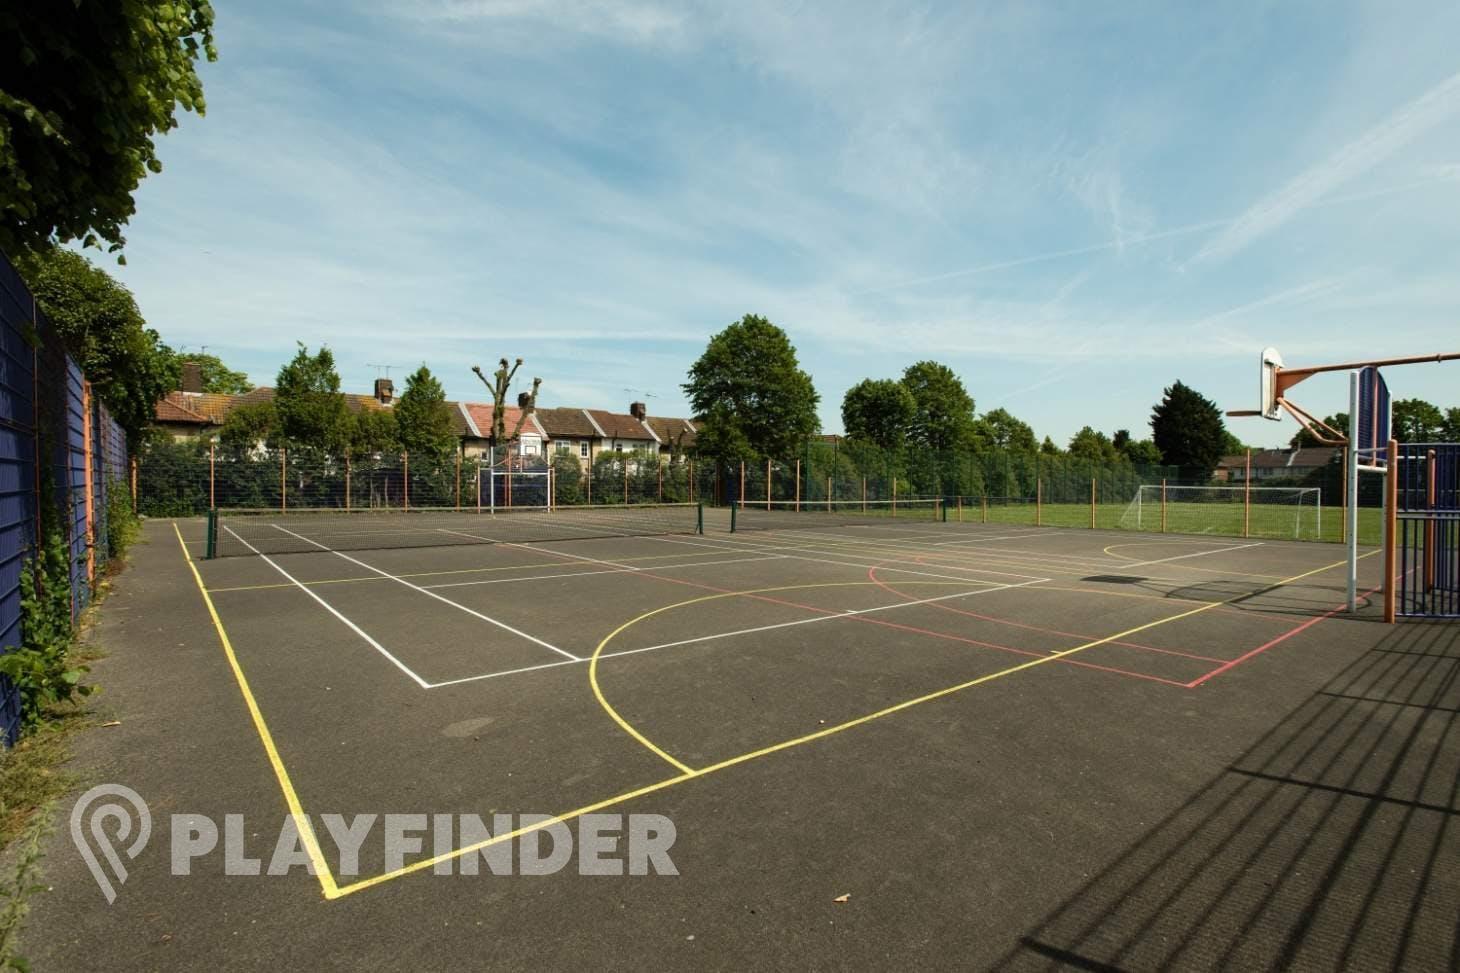 Burnt Oak Leisure Centre Outdoor | Hard (macadam) tennis court